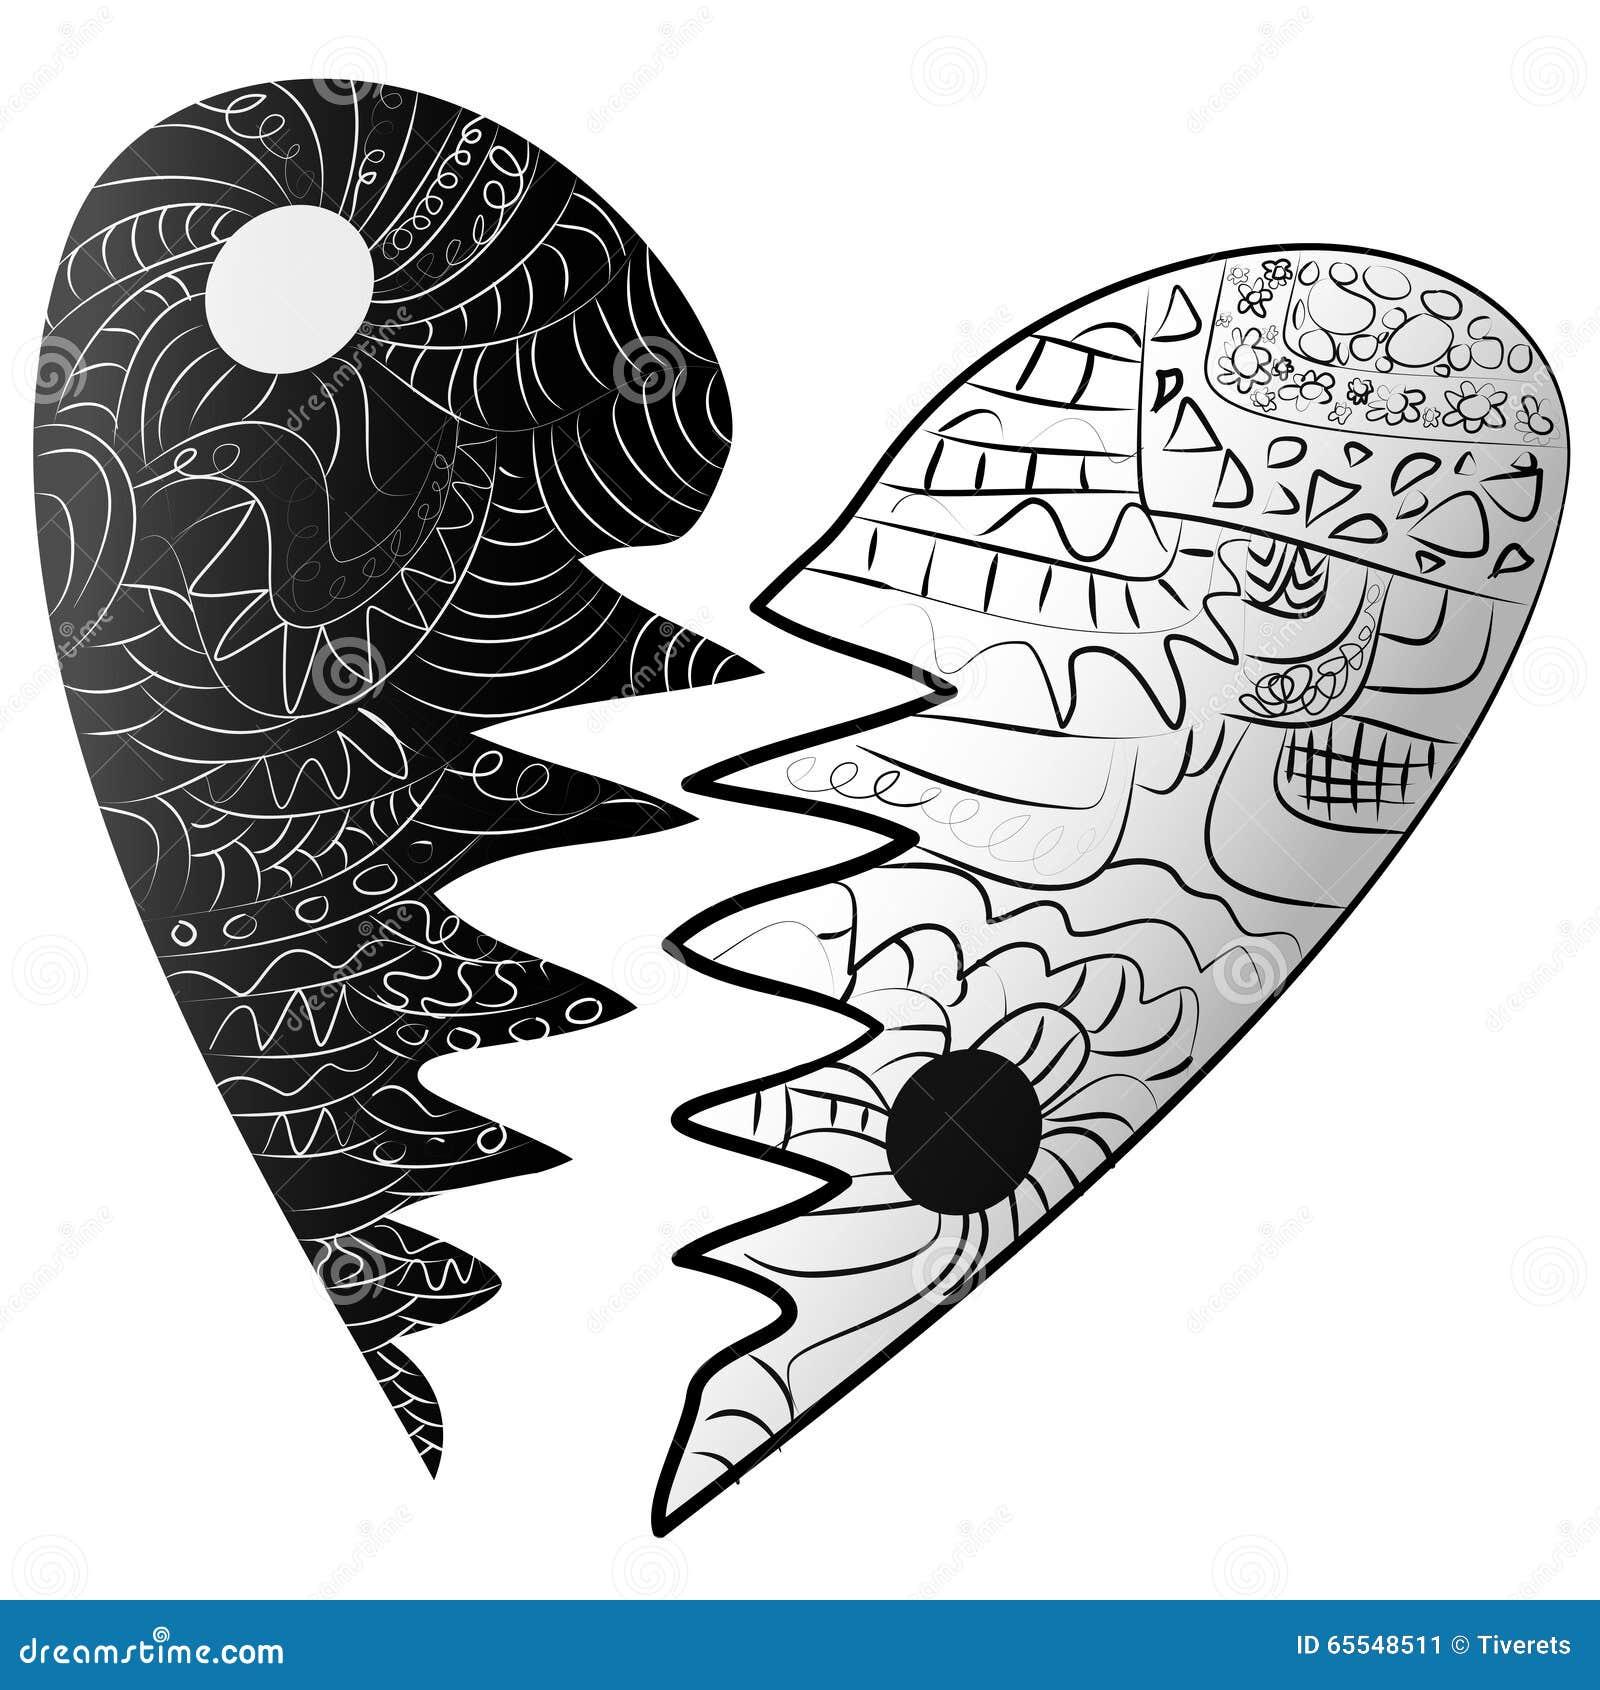 Black And White Broken Heart Drawn Zentangle Style Stock ...